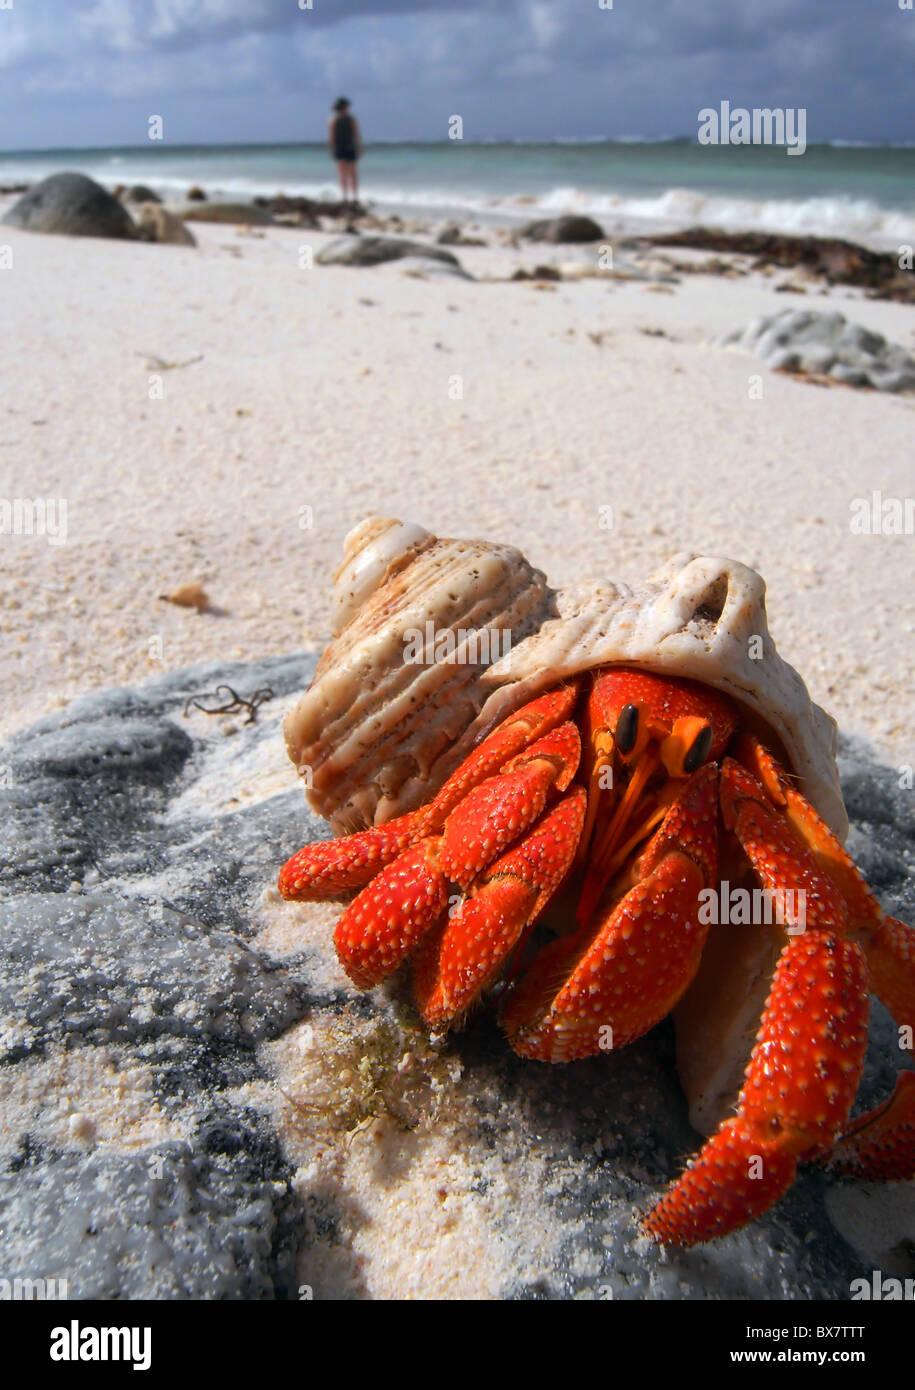 Hermit crab (Coenobita sp.) on the beach of West Island, Cocos Keeling, Indian Ocean Stock Photo